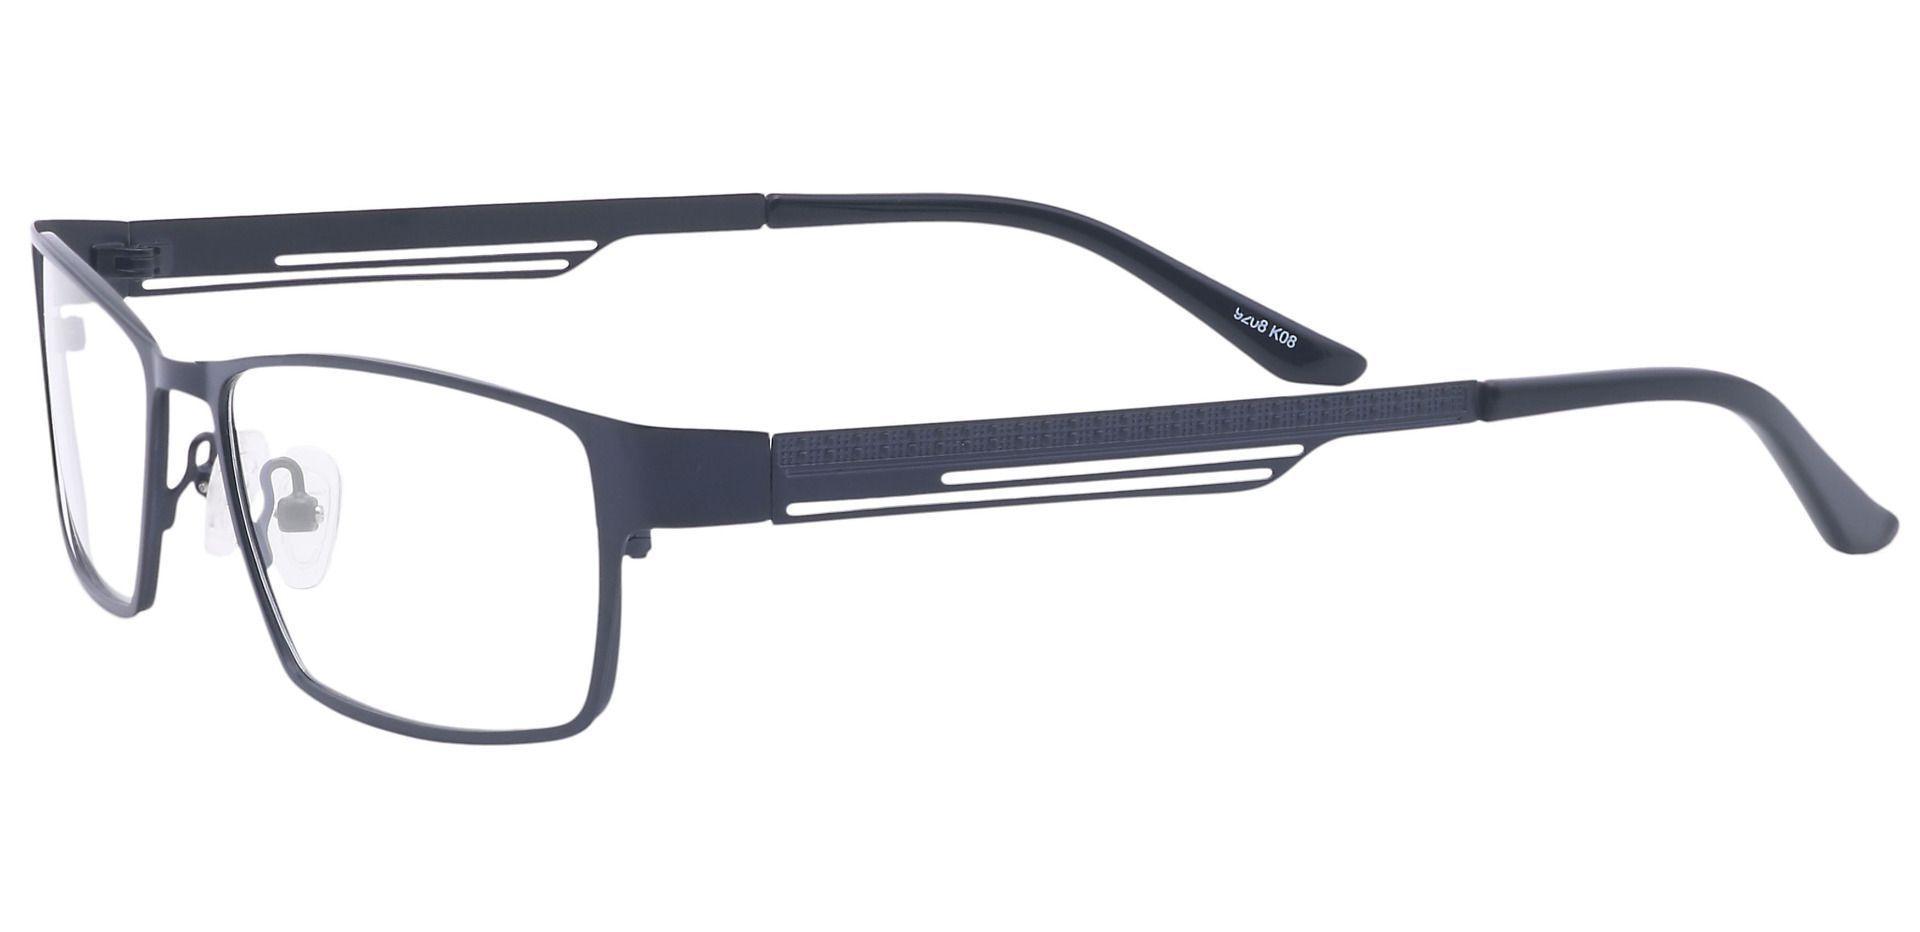 Noble Rectangle Prescription Glasses - Black